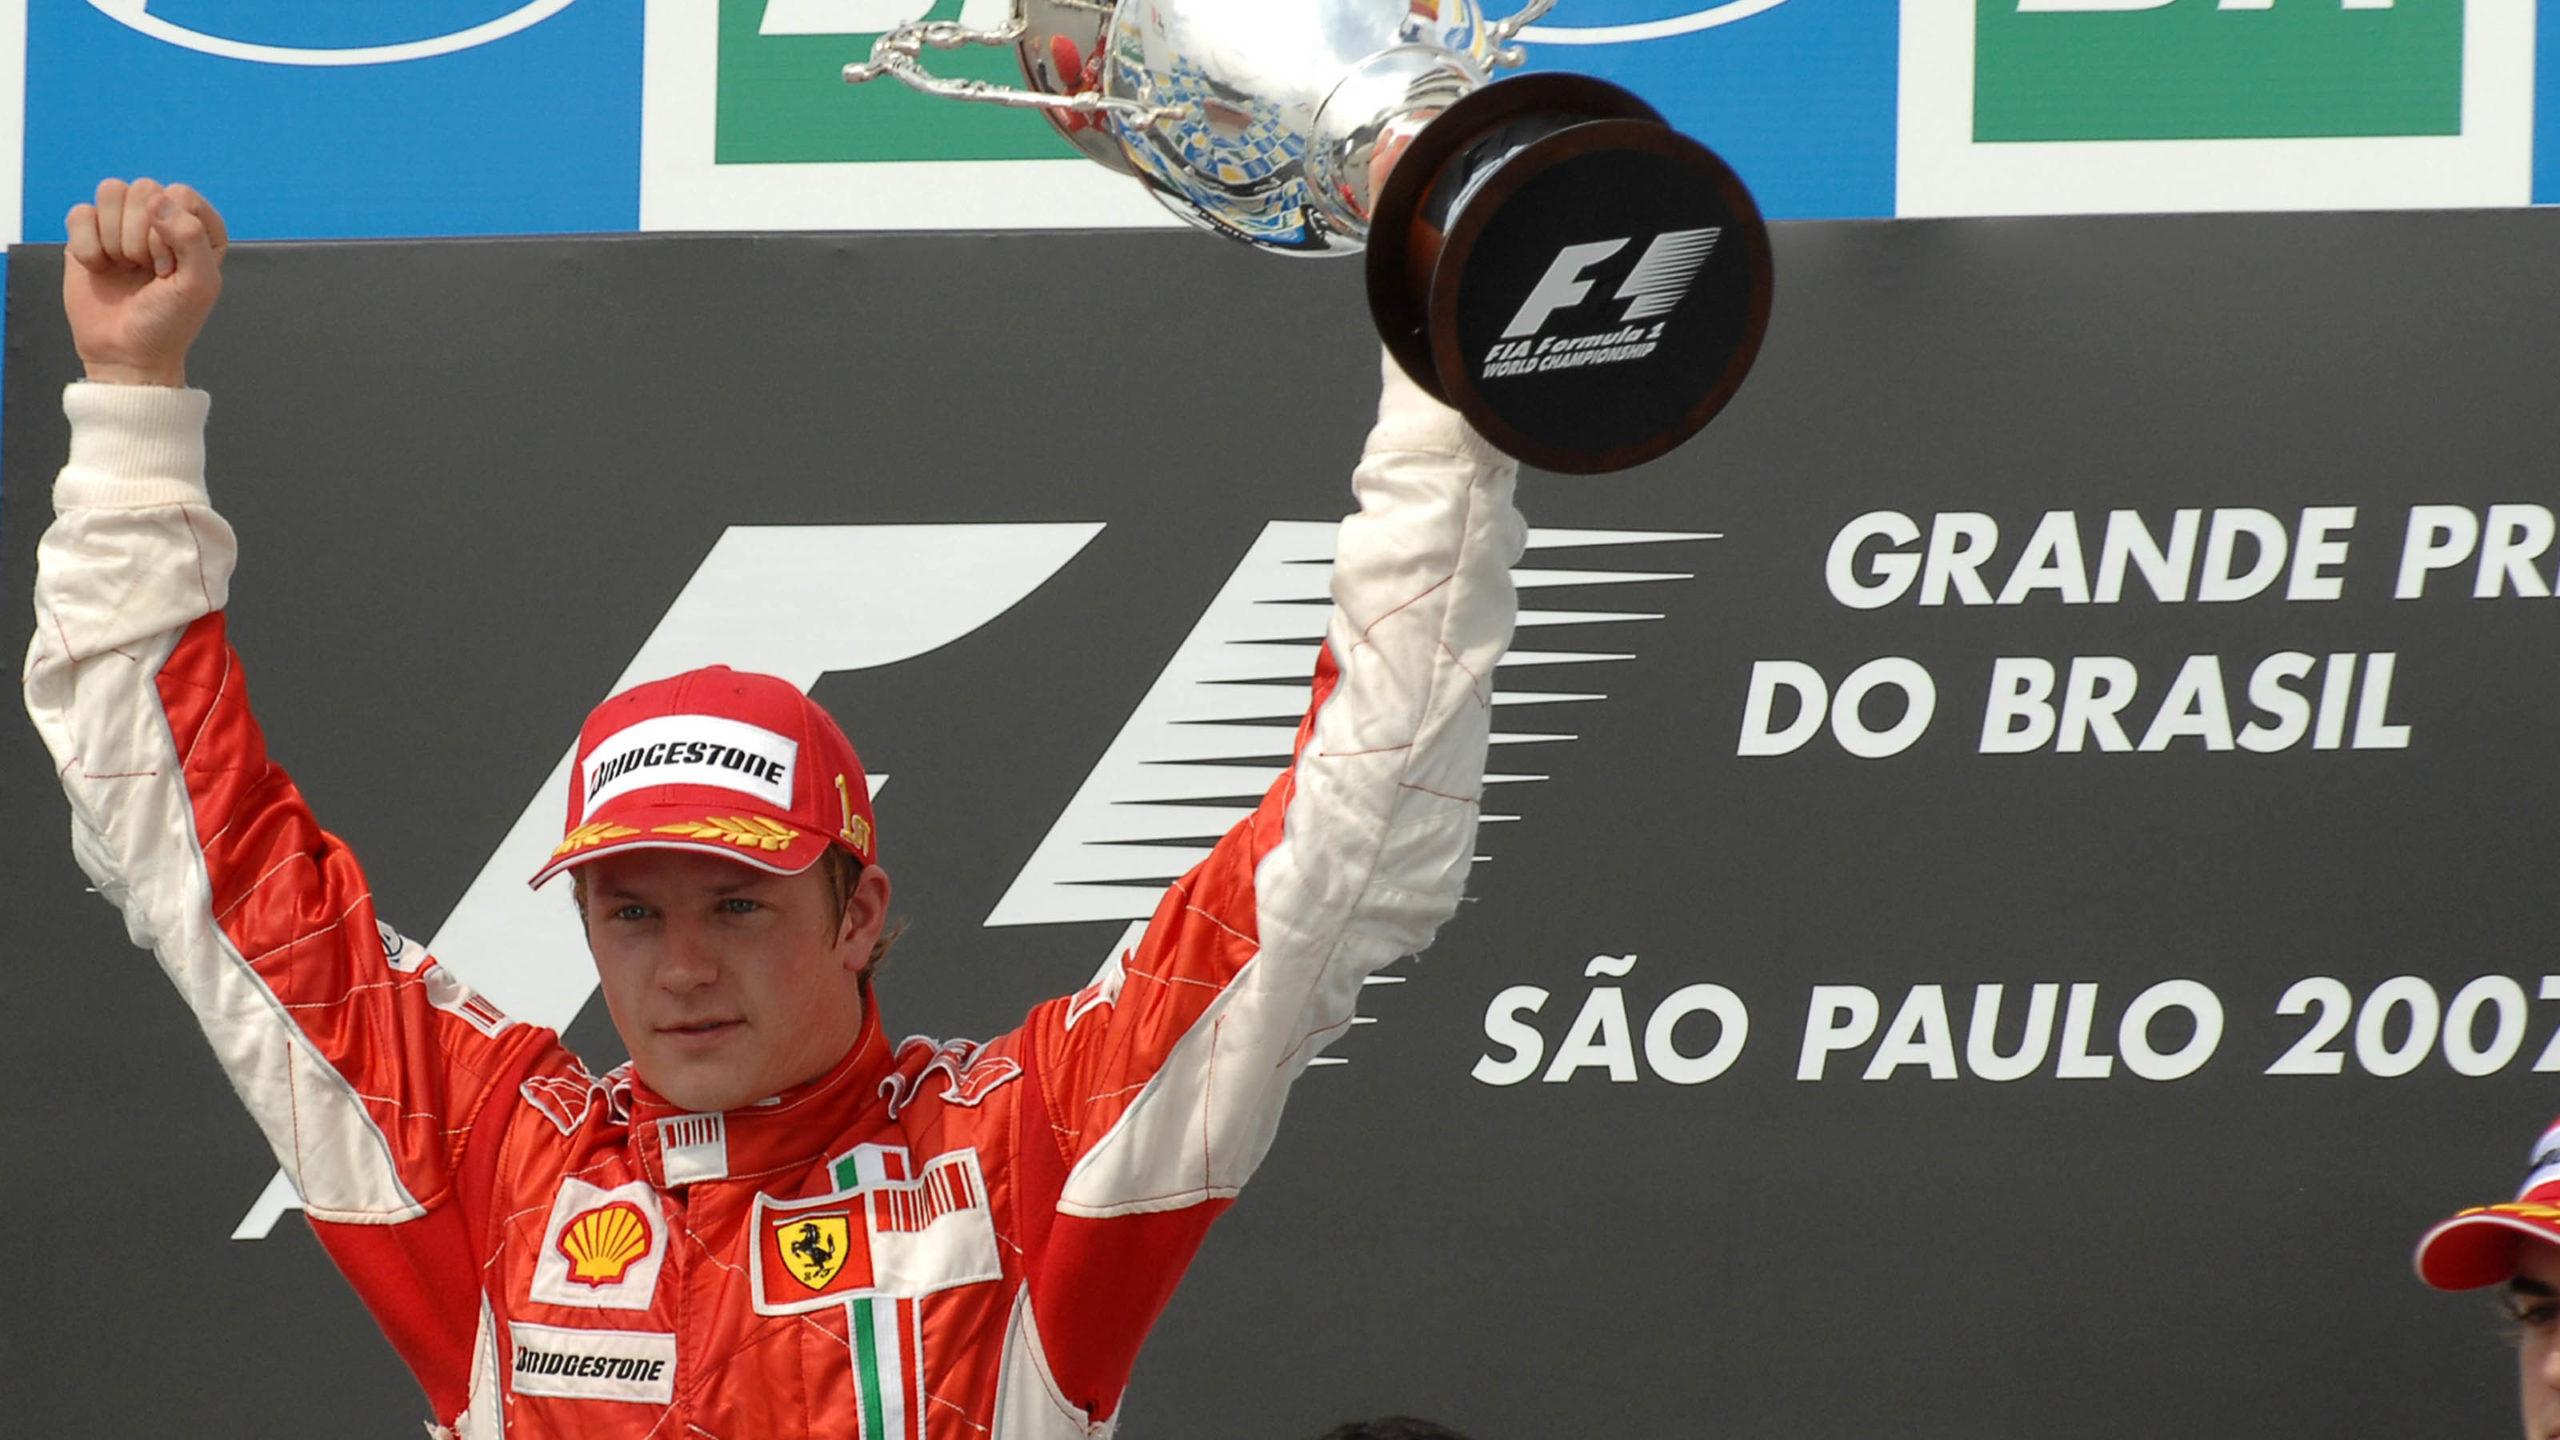 Kimi Raikkonen celebrates becoming world champion at Brazil in 2007